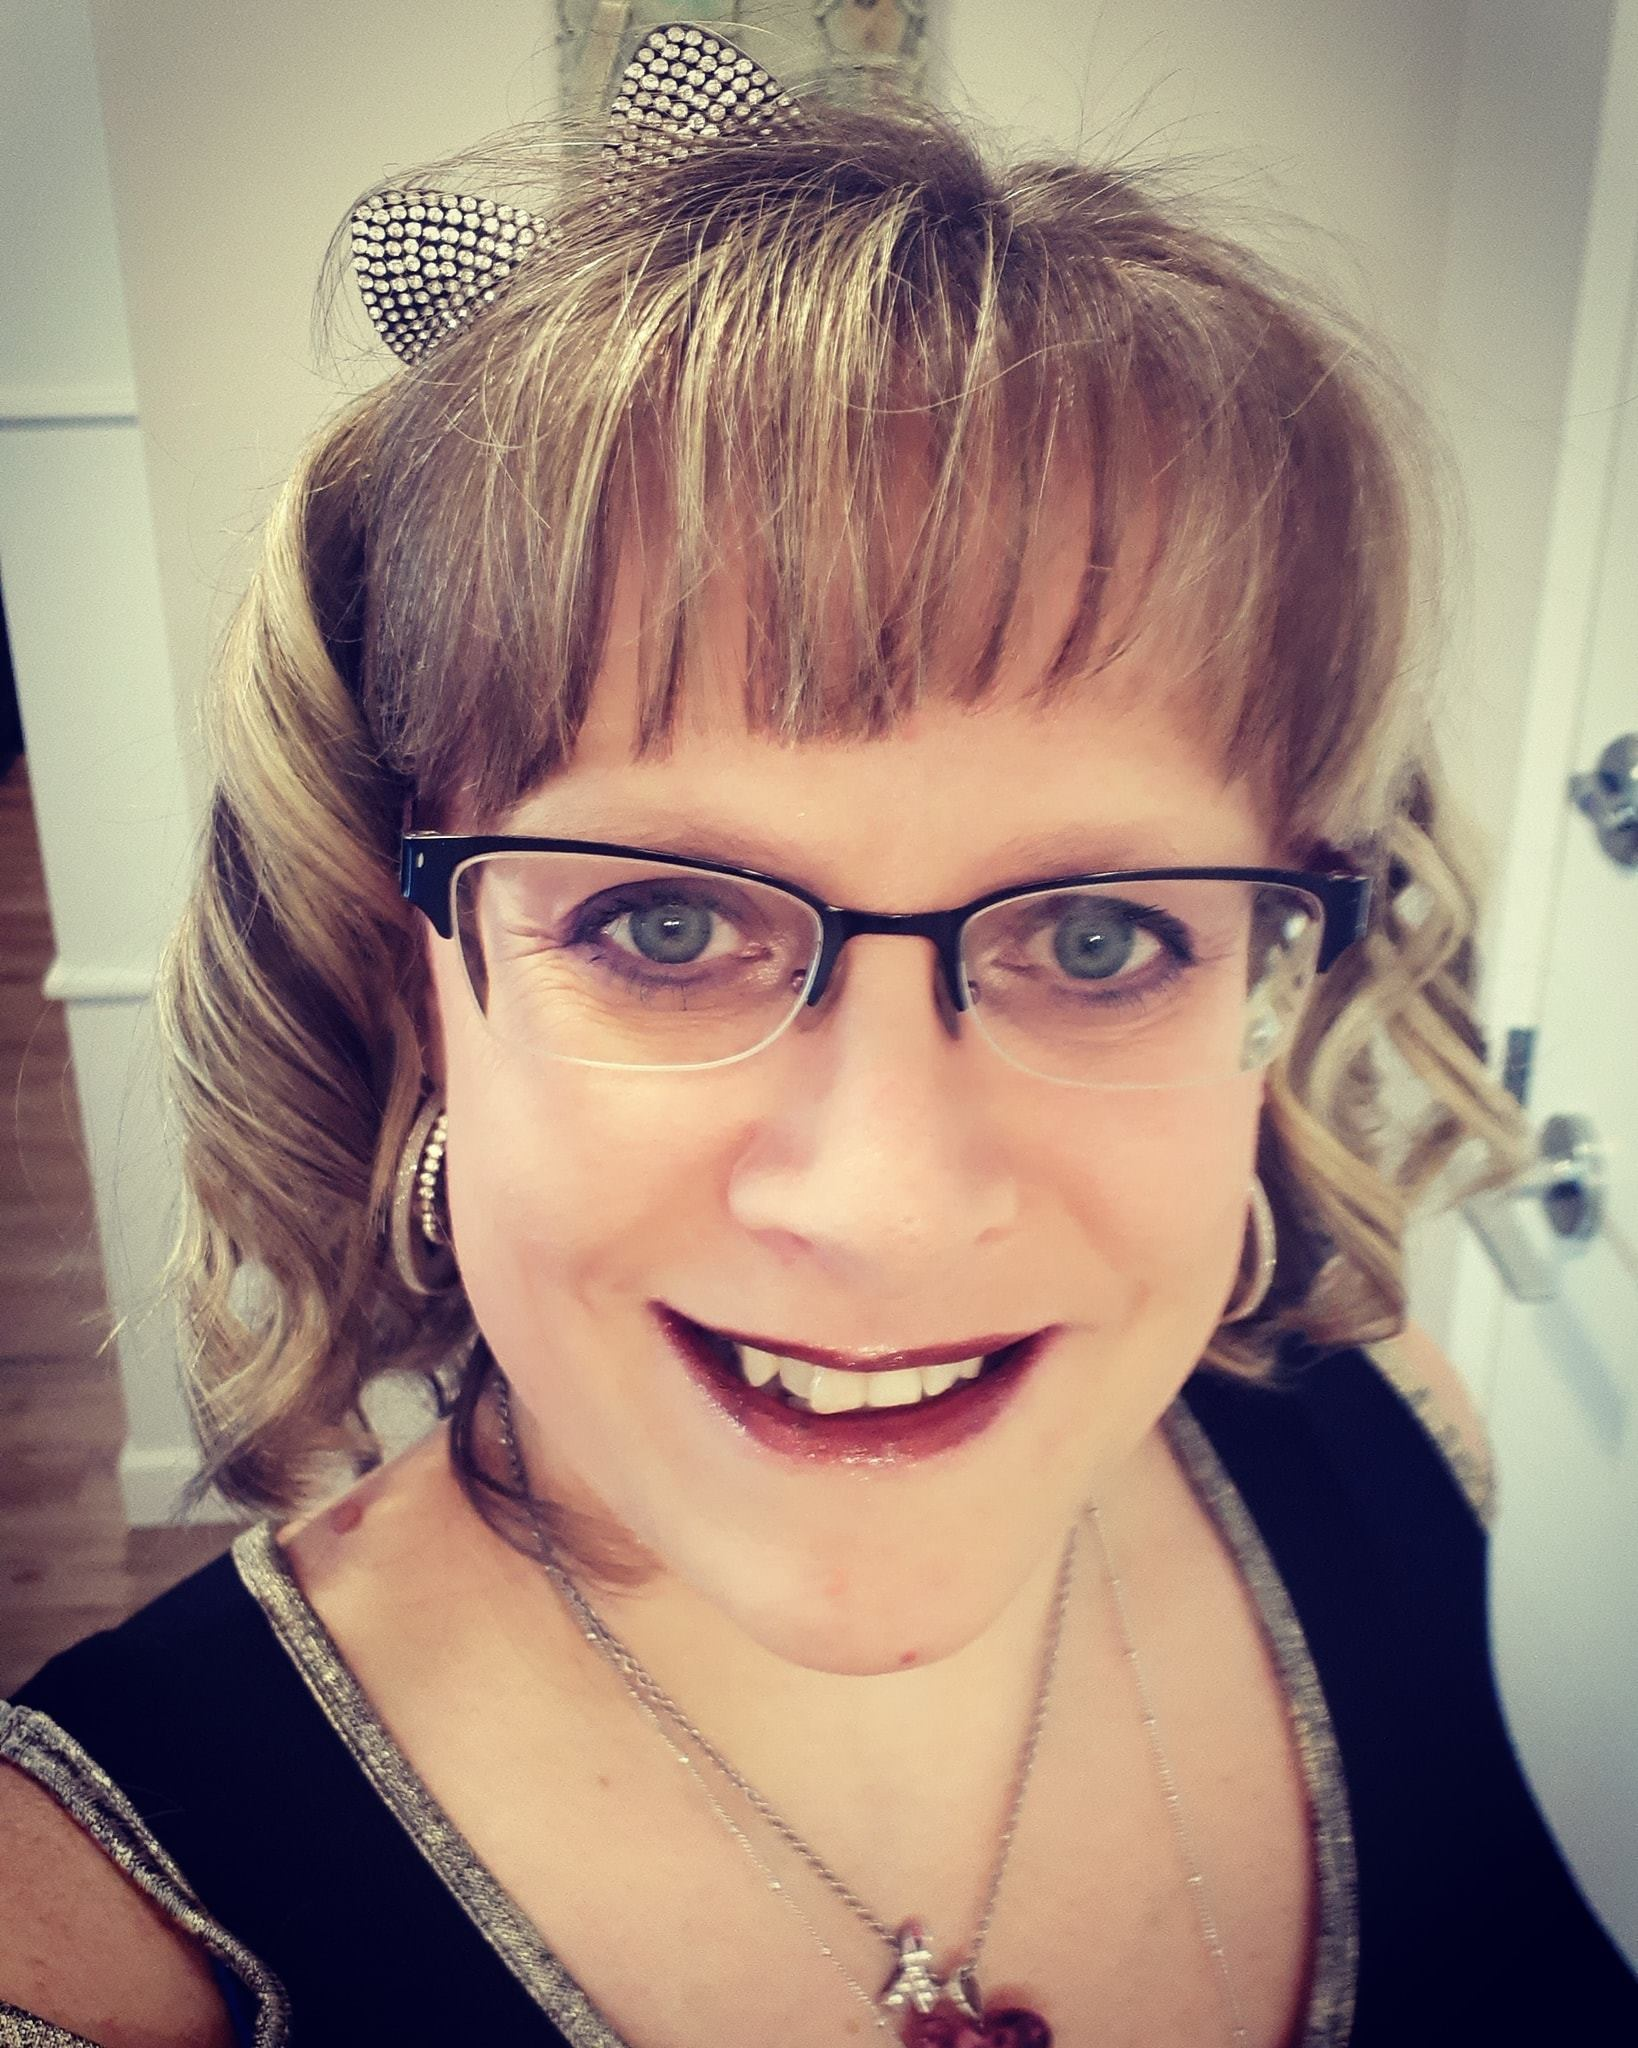 Administration Officer (ADO) - Civilian Instructor Melissa Davis